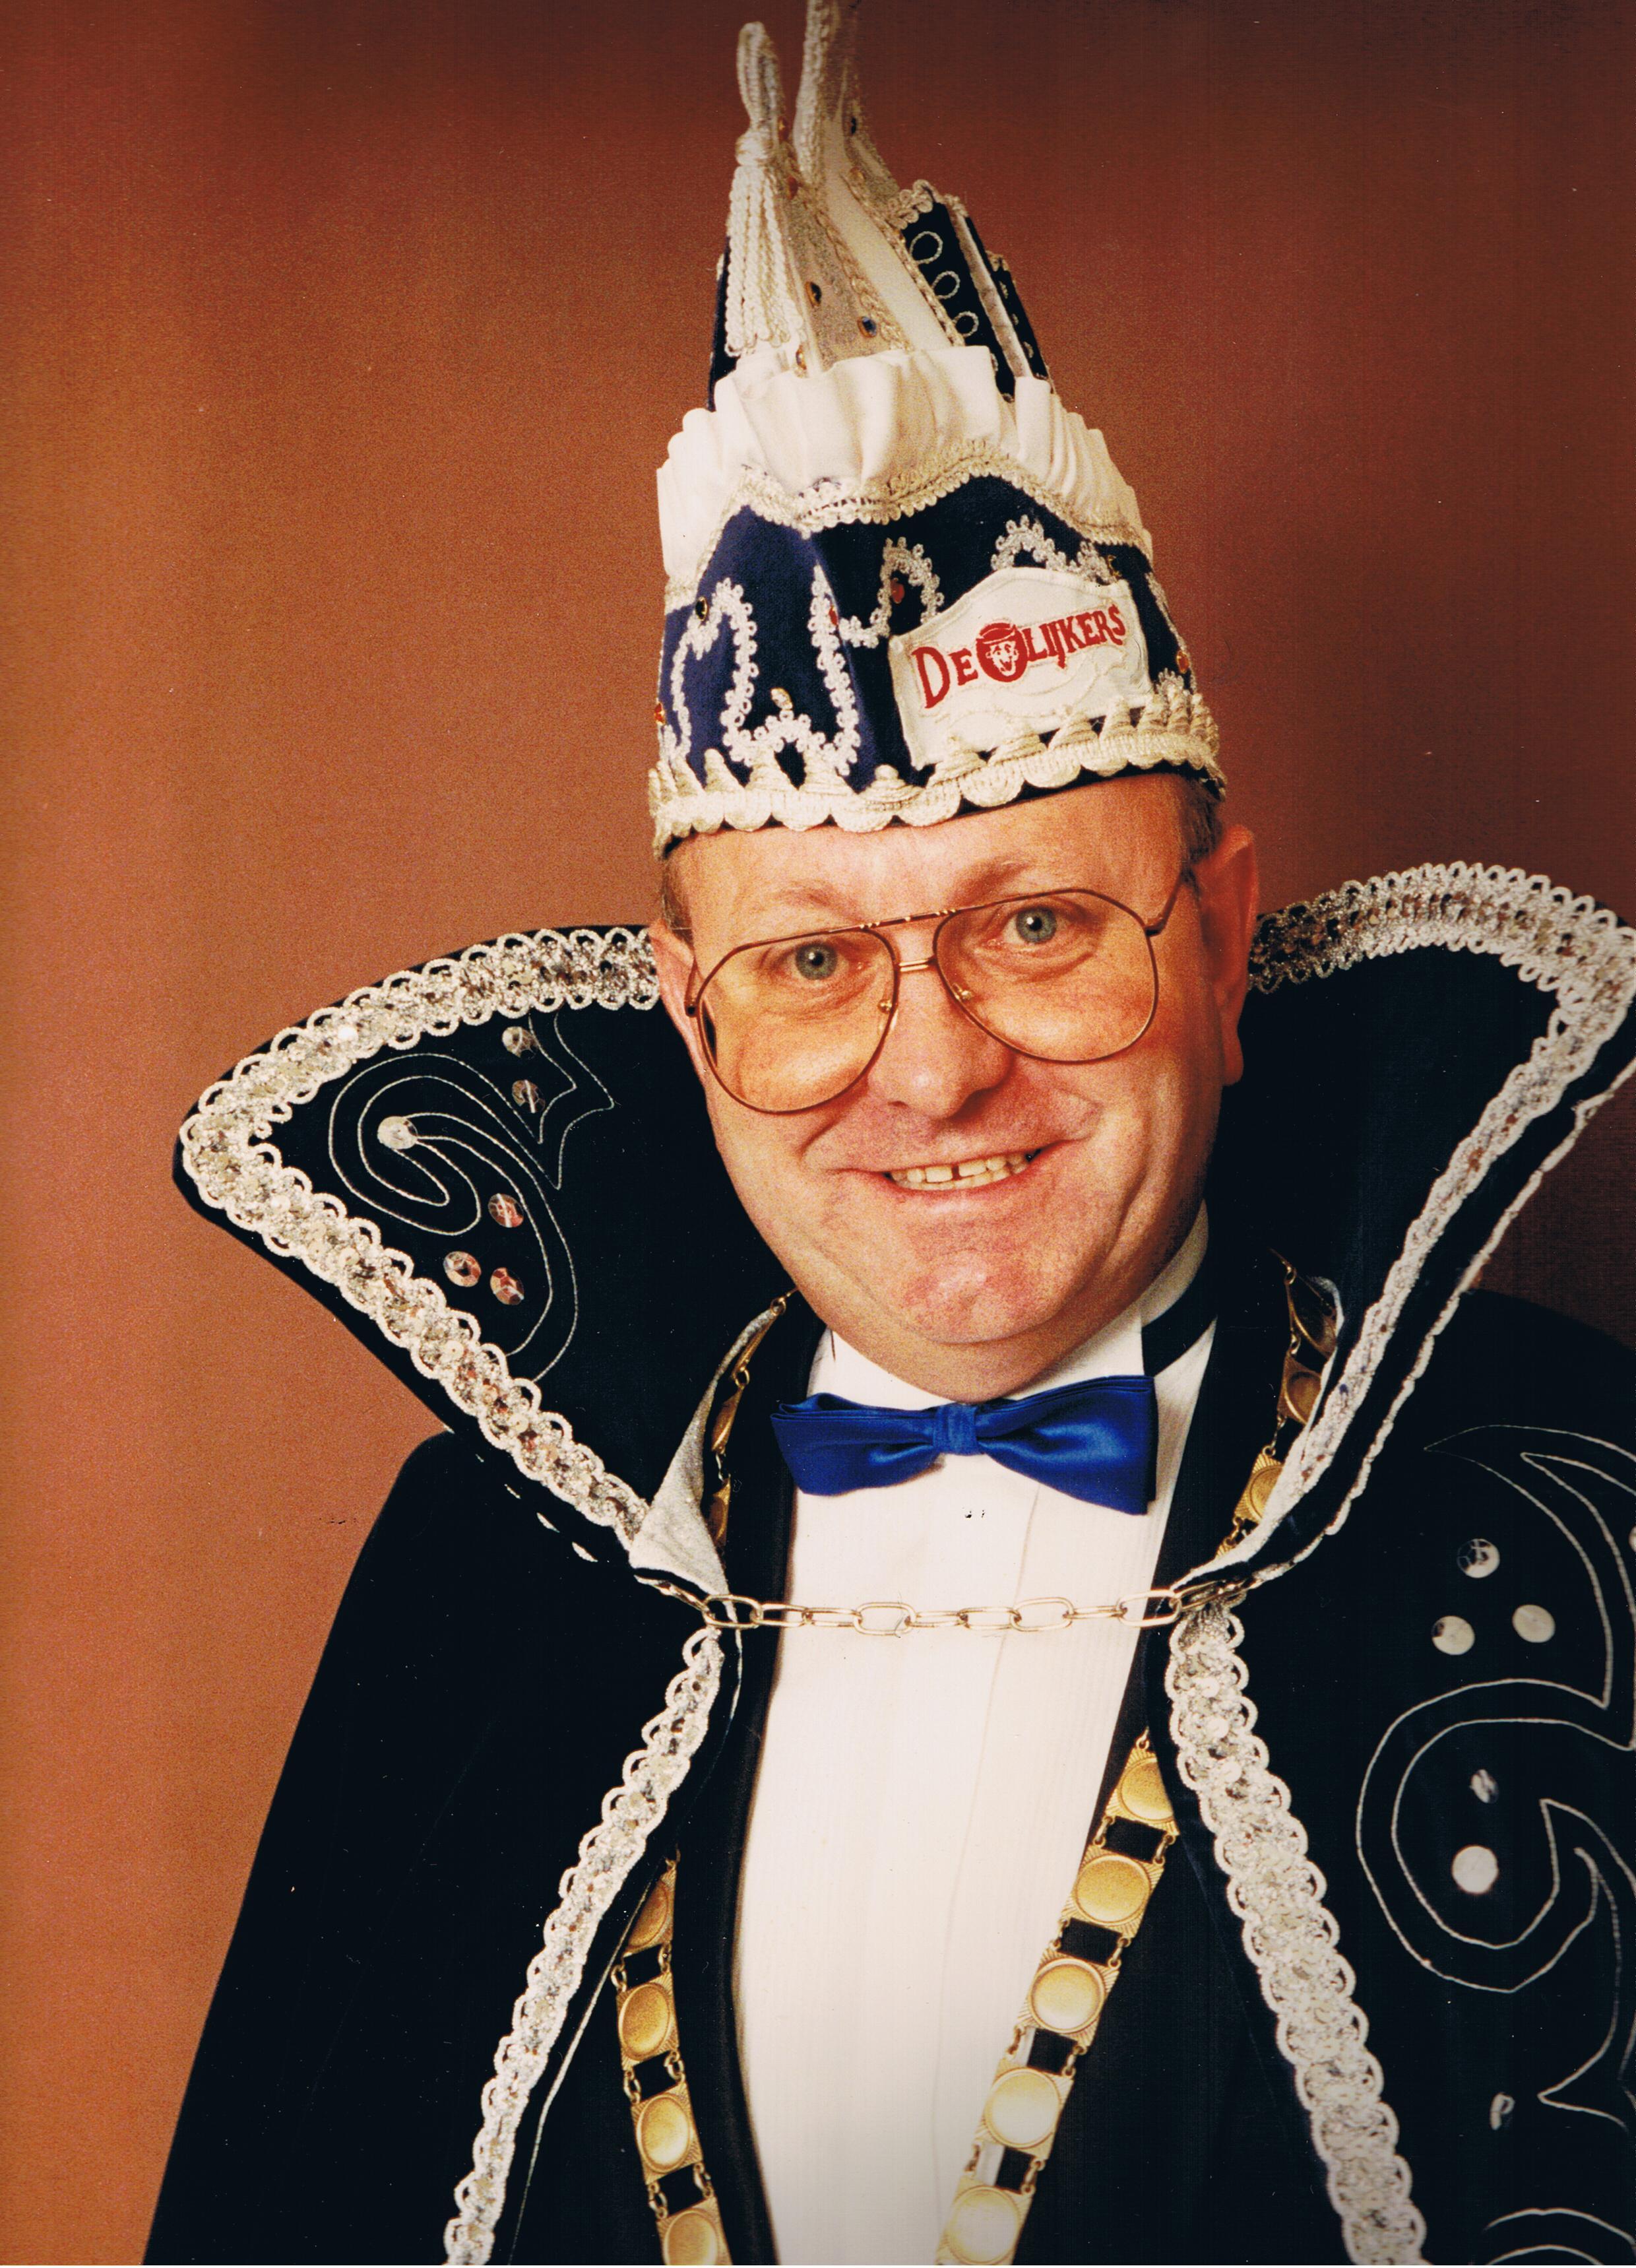 1989 1990 Prins Aad de 2e Aad de Koning